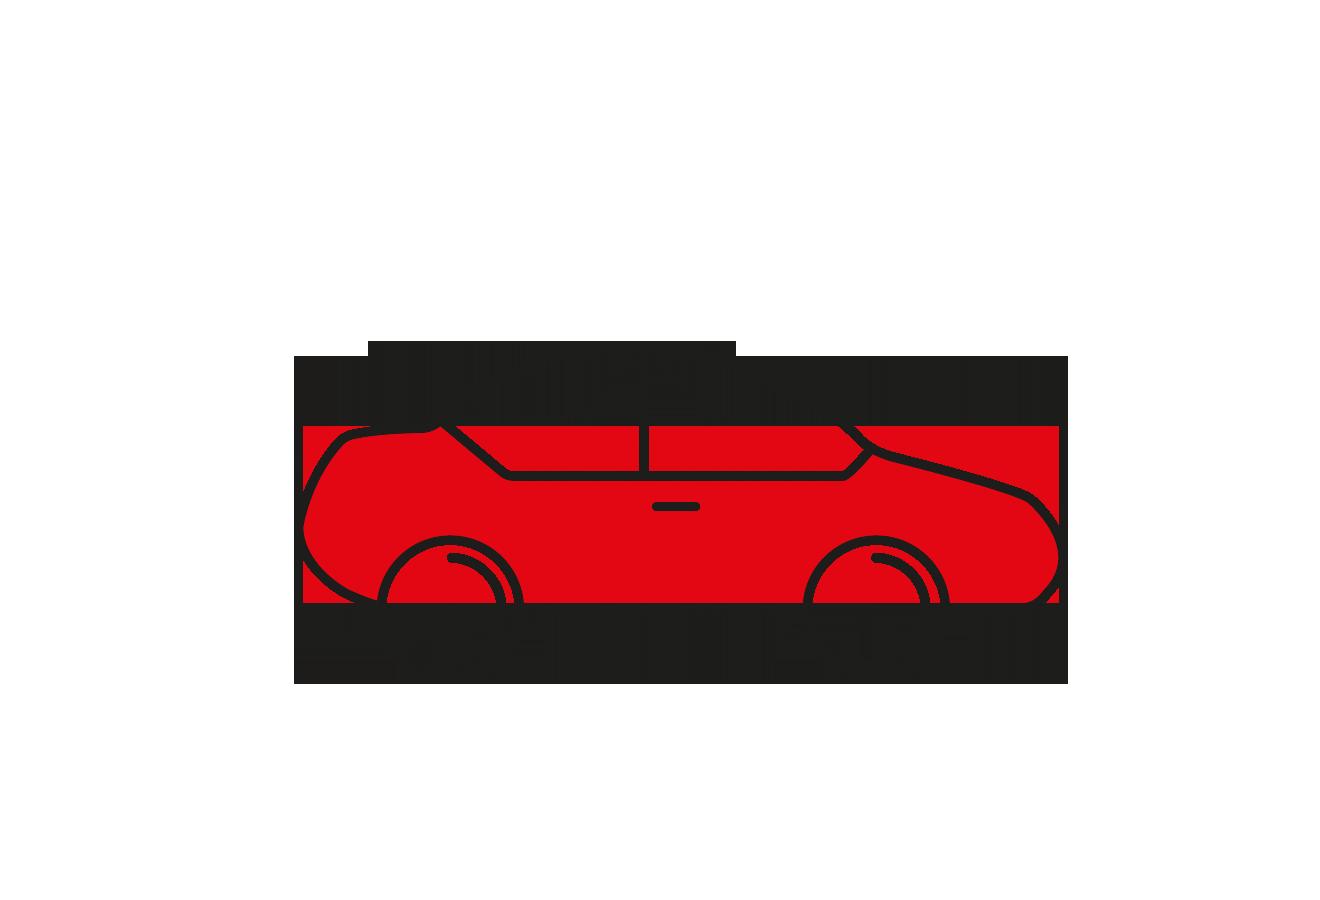 car_icon_rot